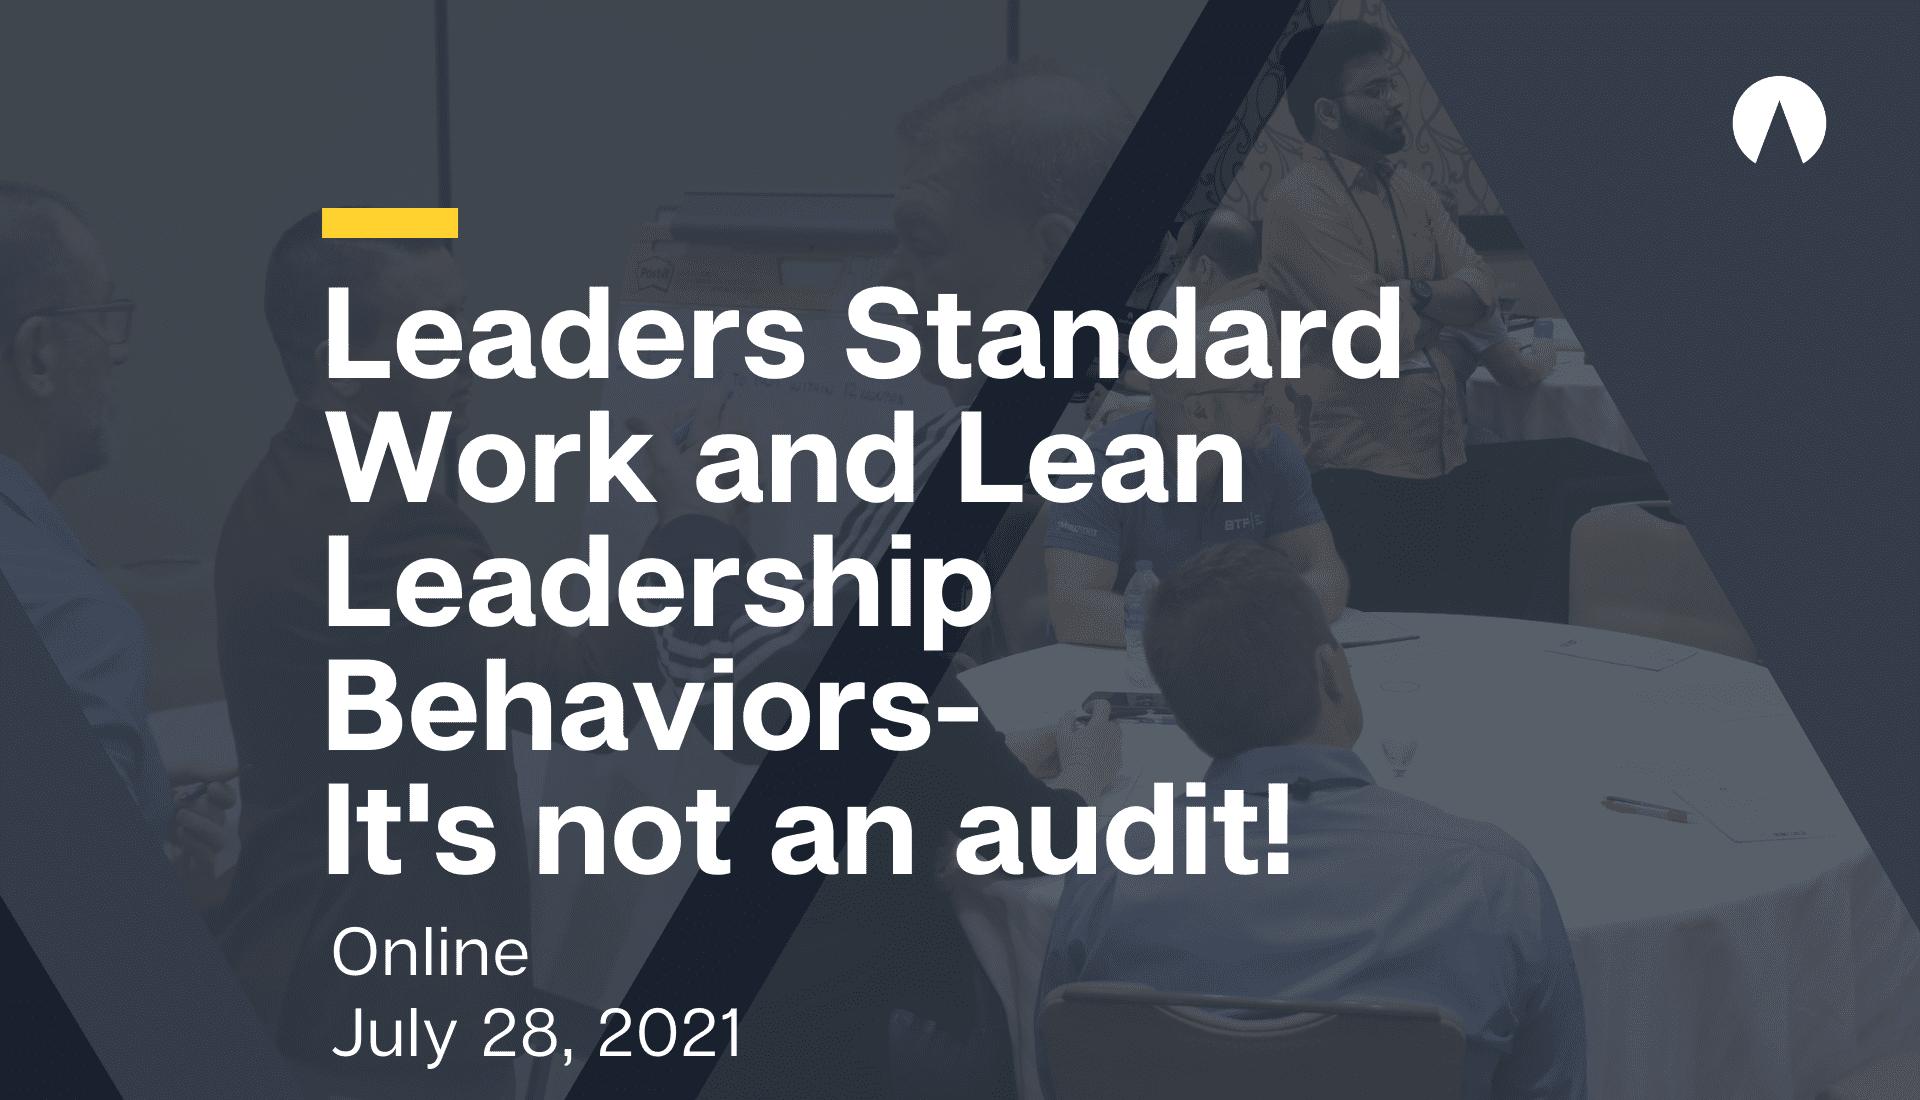 Leaders Standard Work and Lean Leadership Behaviors- It's not an audit!